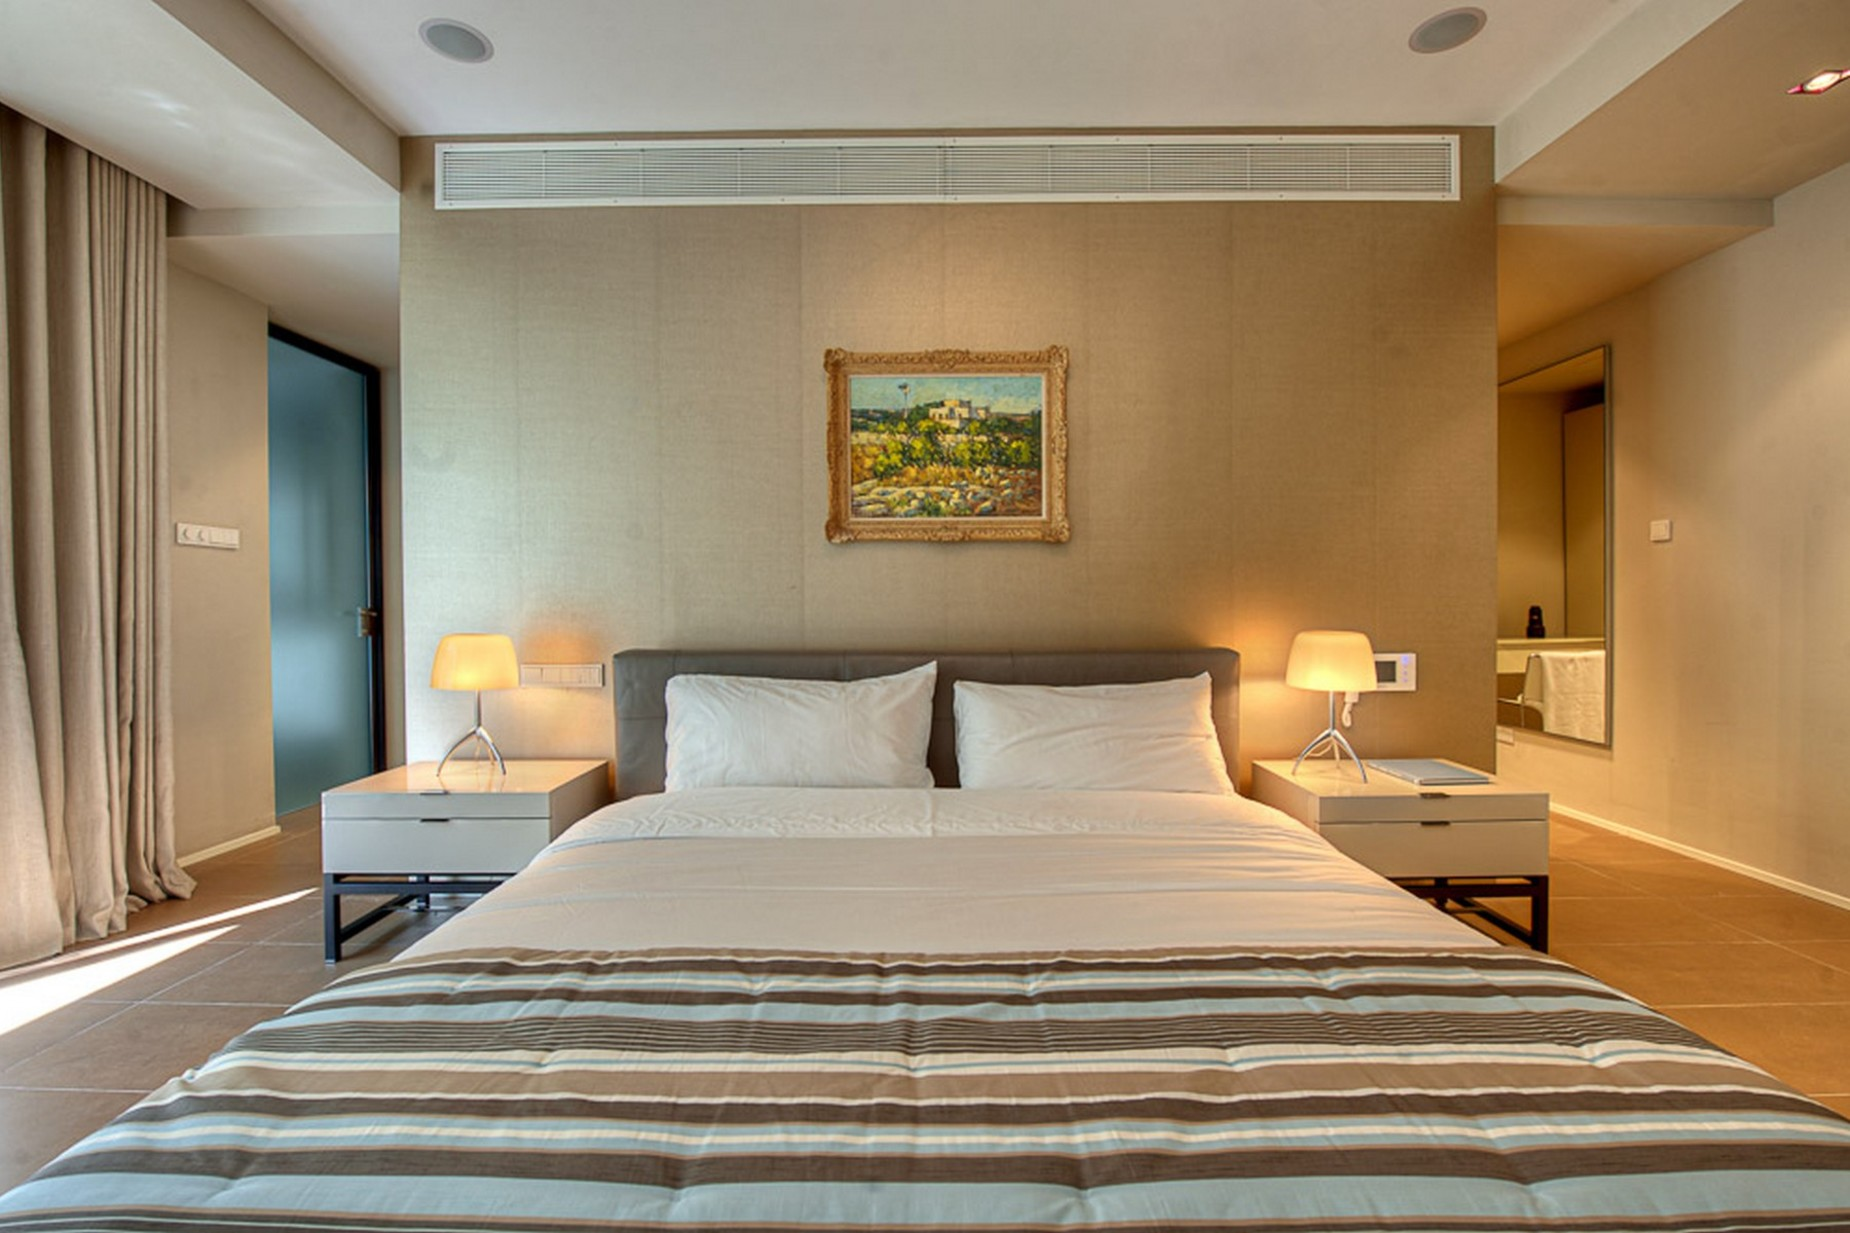 3 bed Villa For Sale in Bahar ic-Caghaq, Bahar ic-Caghaq - thumb 11